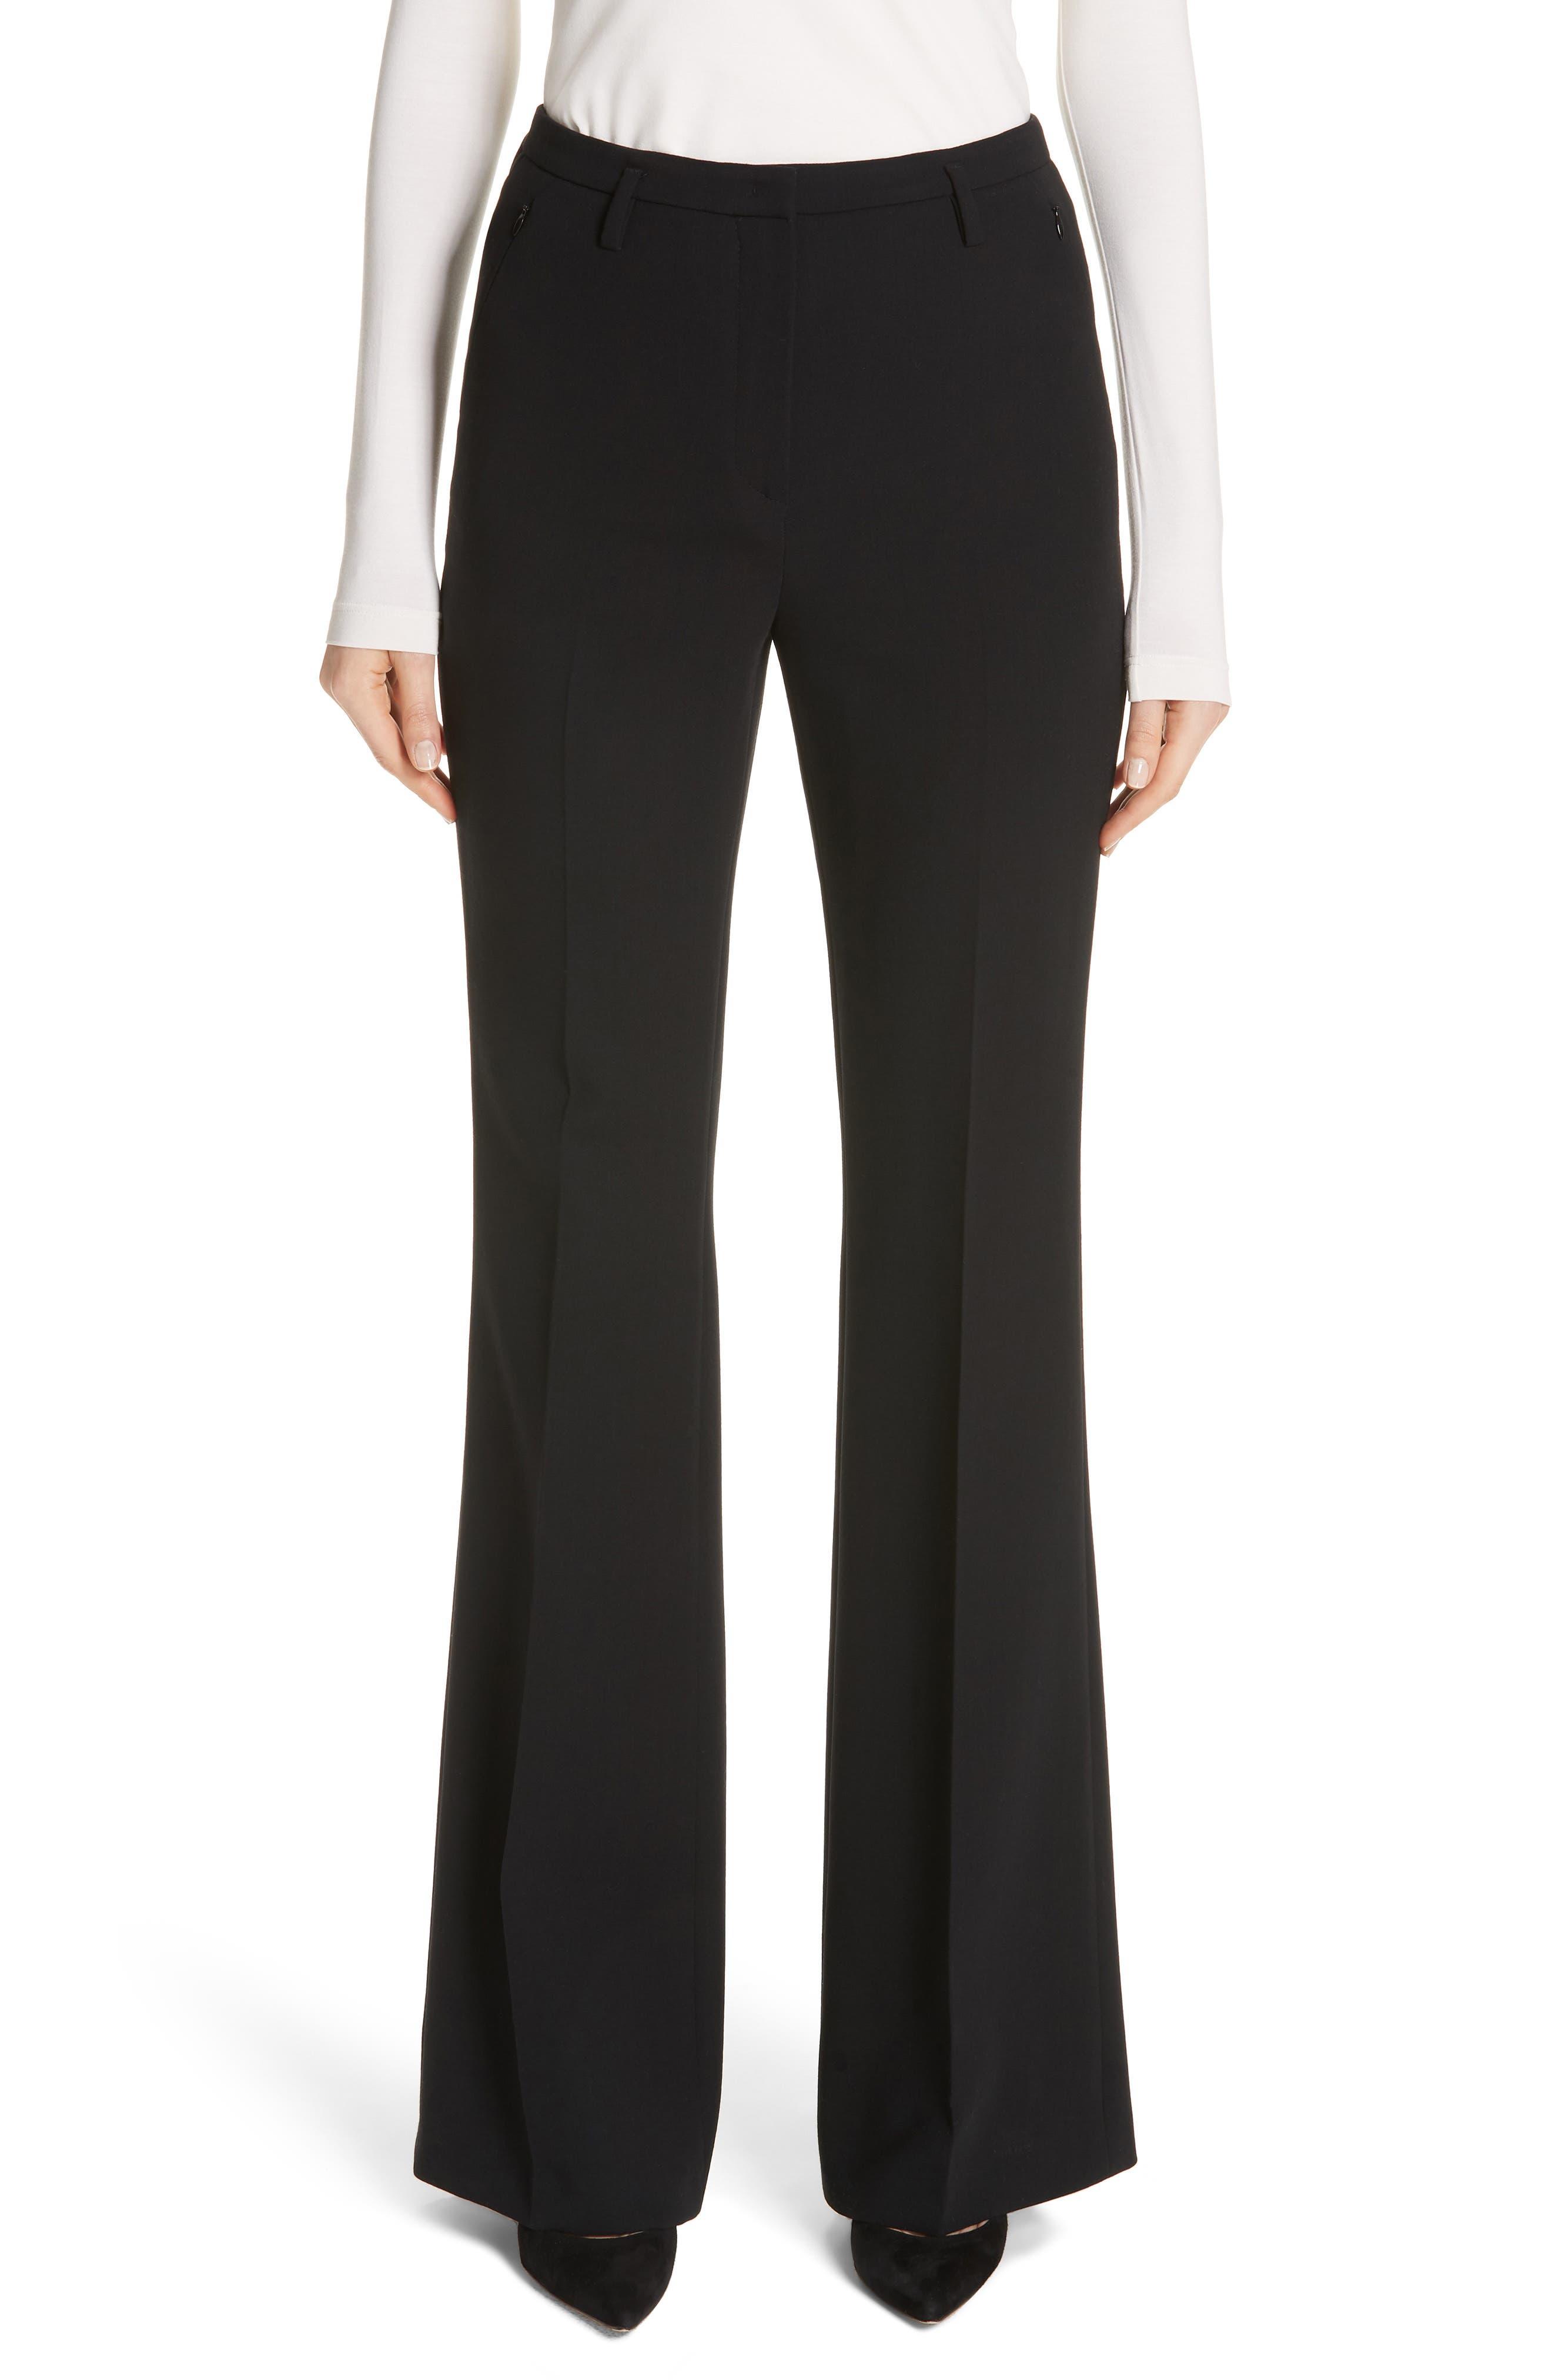 AKRIS, Farrah Stretch Wool Flare Pants, Main thumbnail 1, color, BLACK